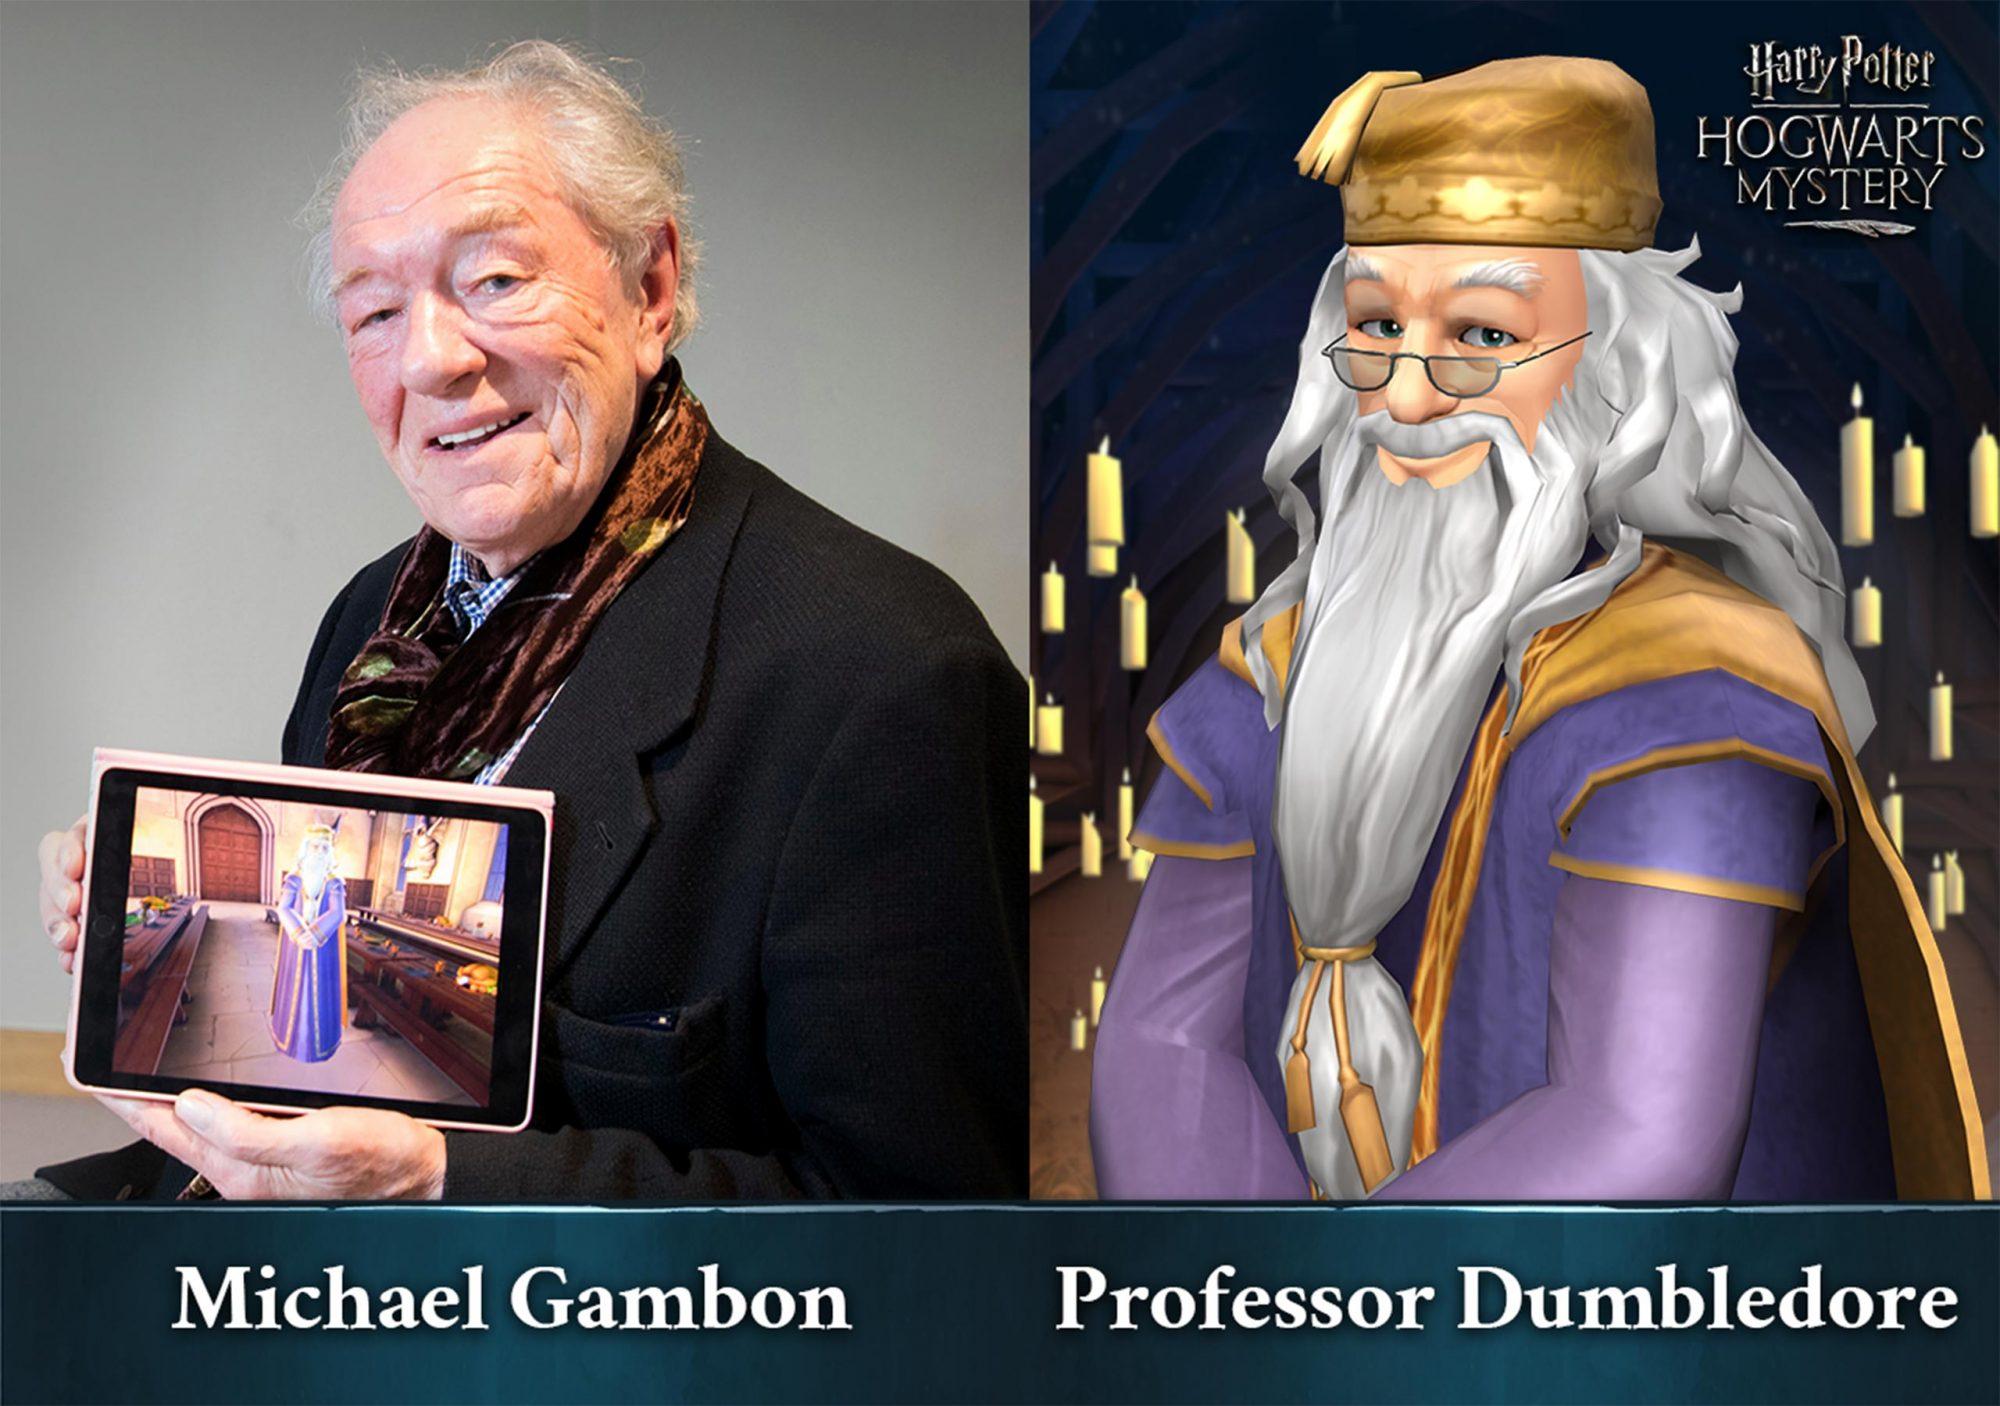 HP_Press_MichaelGambon_Dumbledore_02